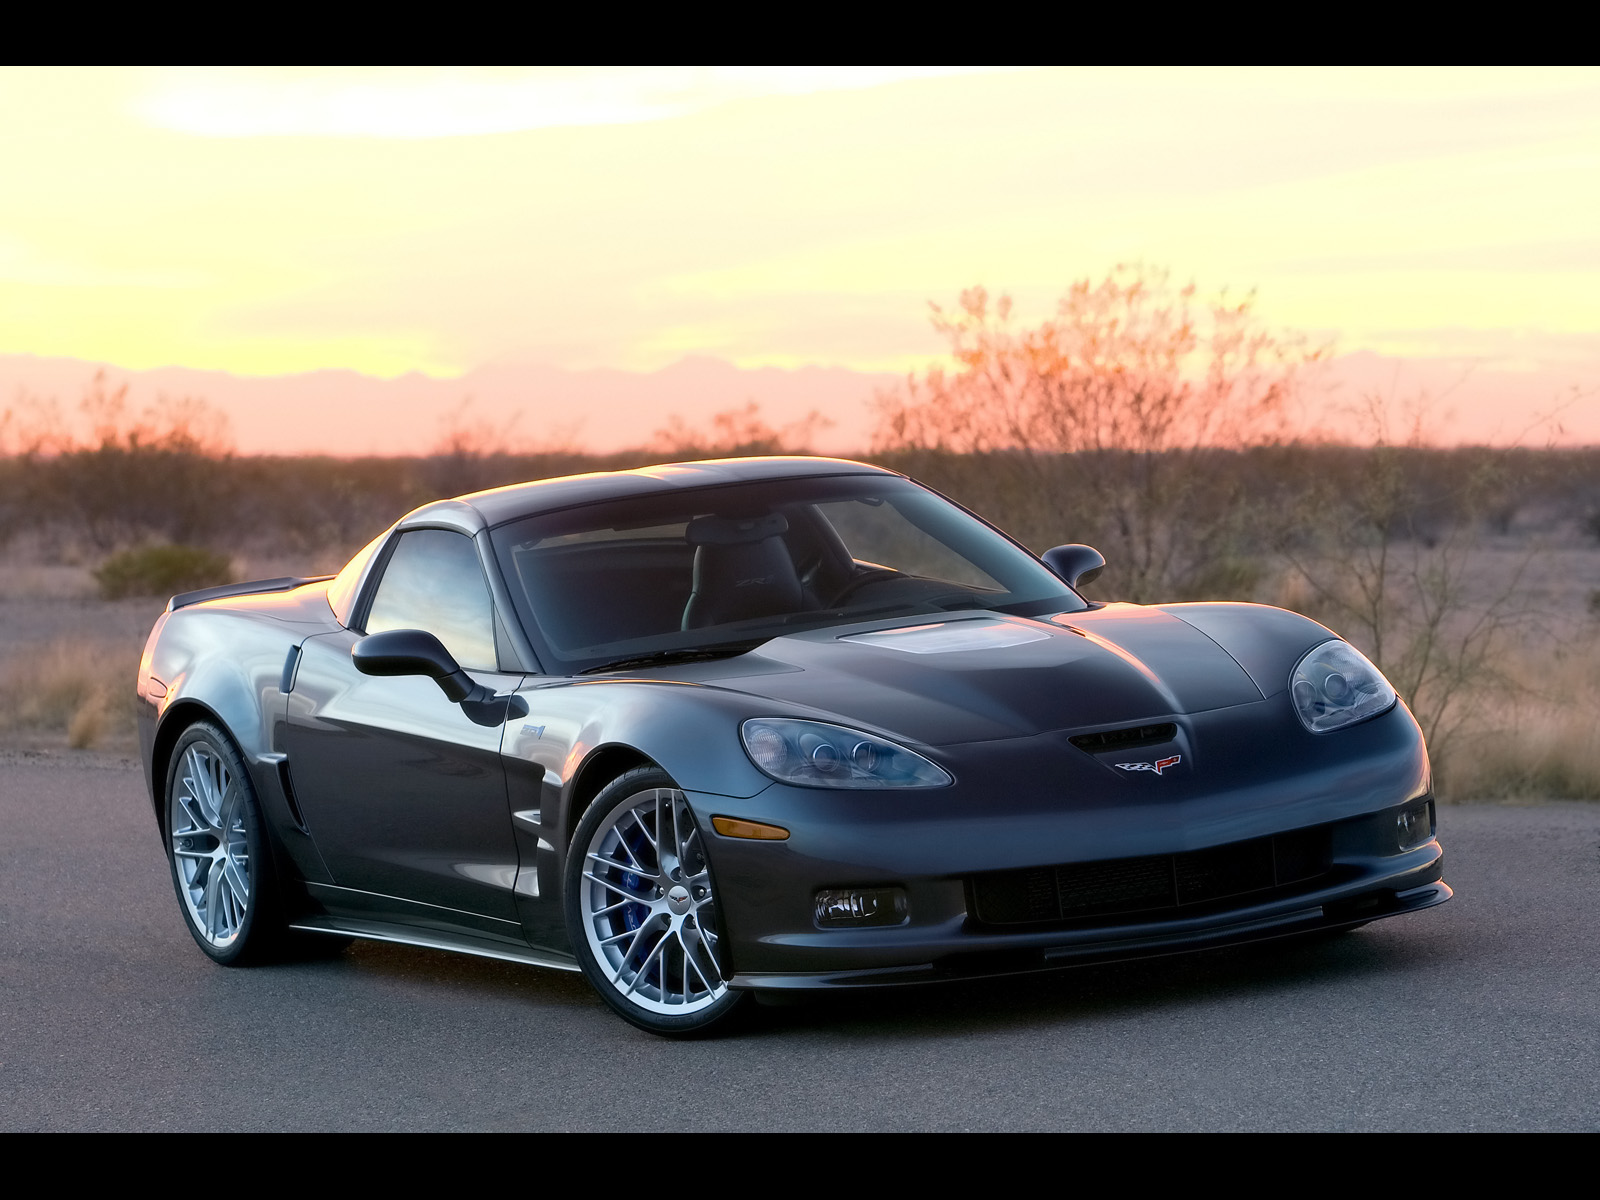 Desktop wallpaper downloads 2009 Chevrolet Corvette ZR1 Grey 1600x1200